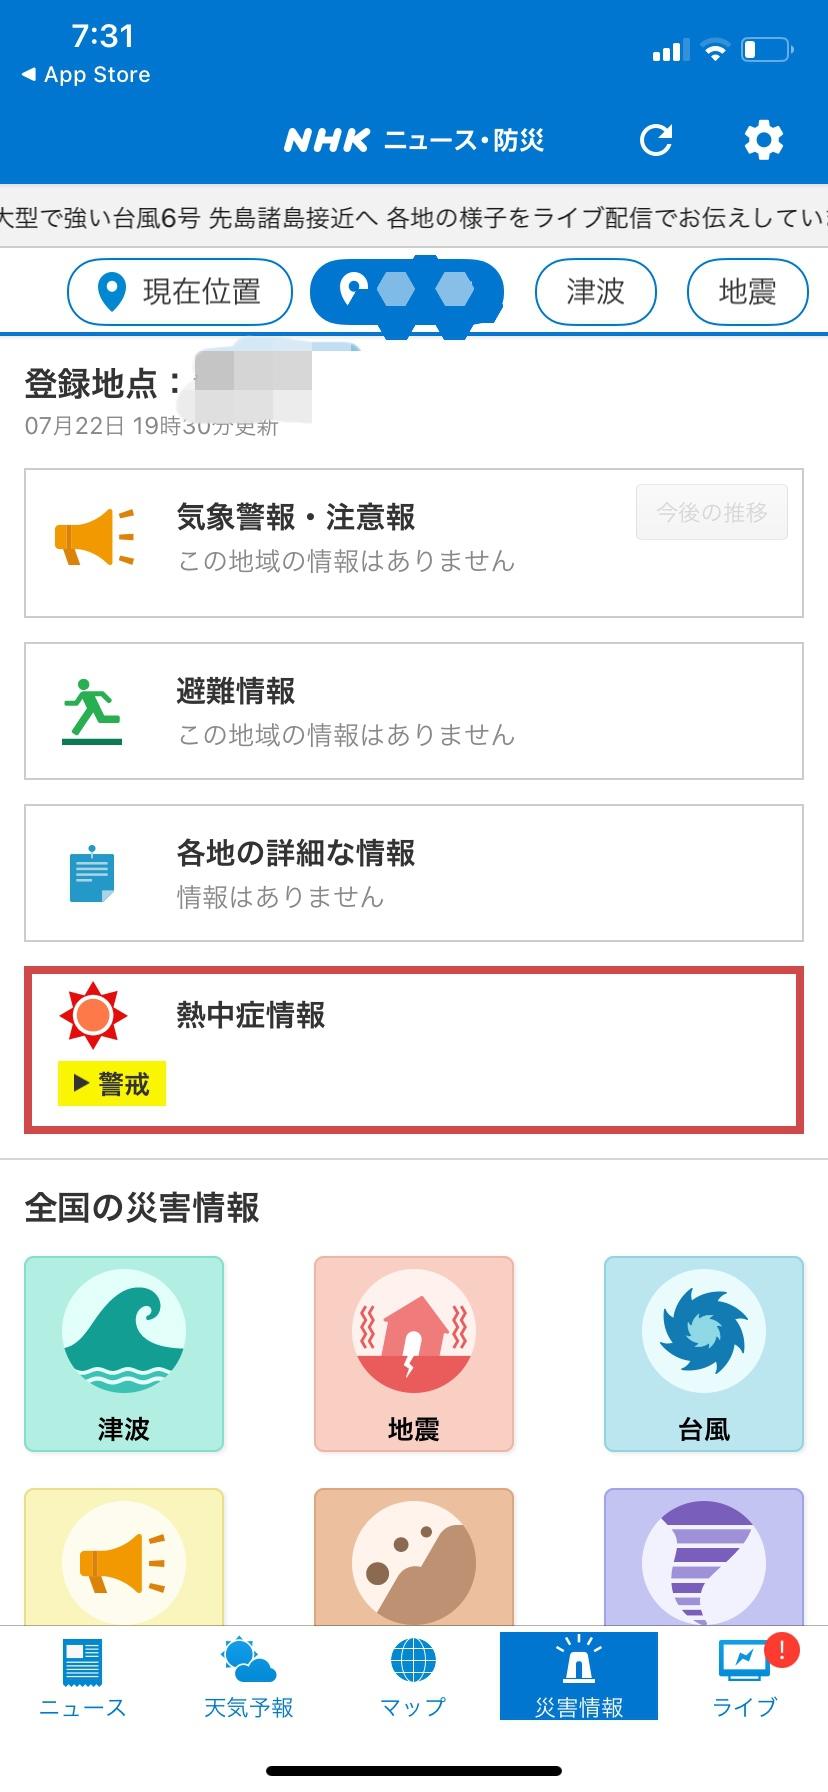 NHK(エヌエイチケー) NHK ニュース・防災を使ったヨコさんのクチコミ画像1